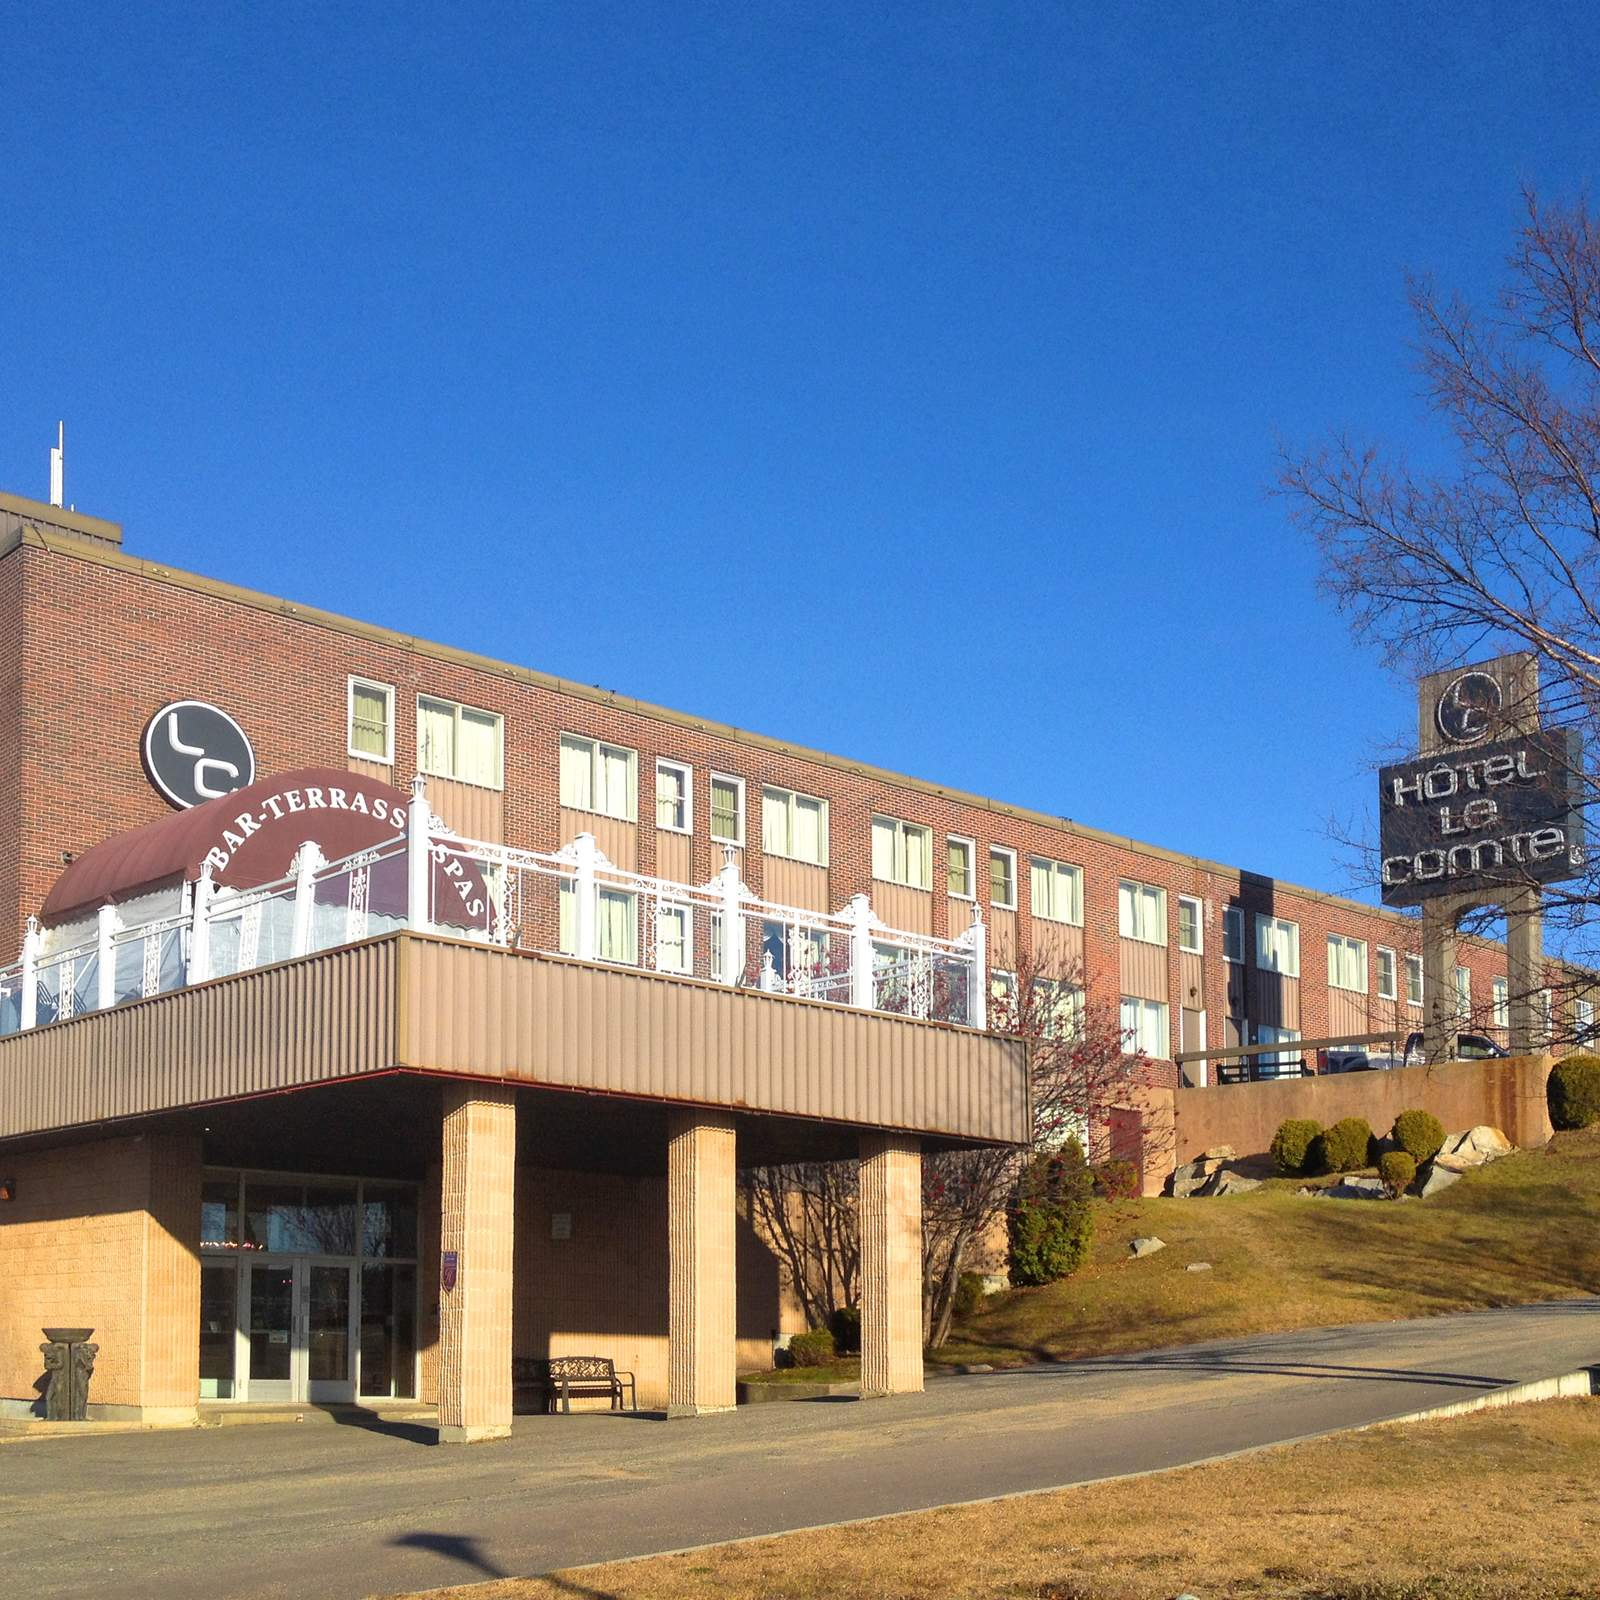 Hotel Motel Le Comte